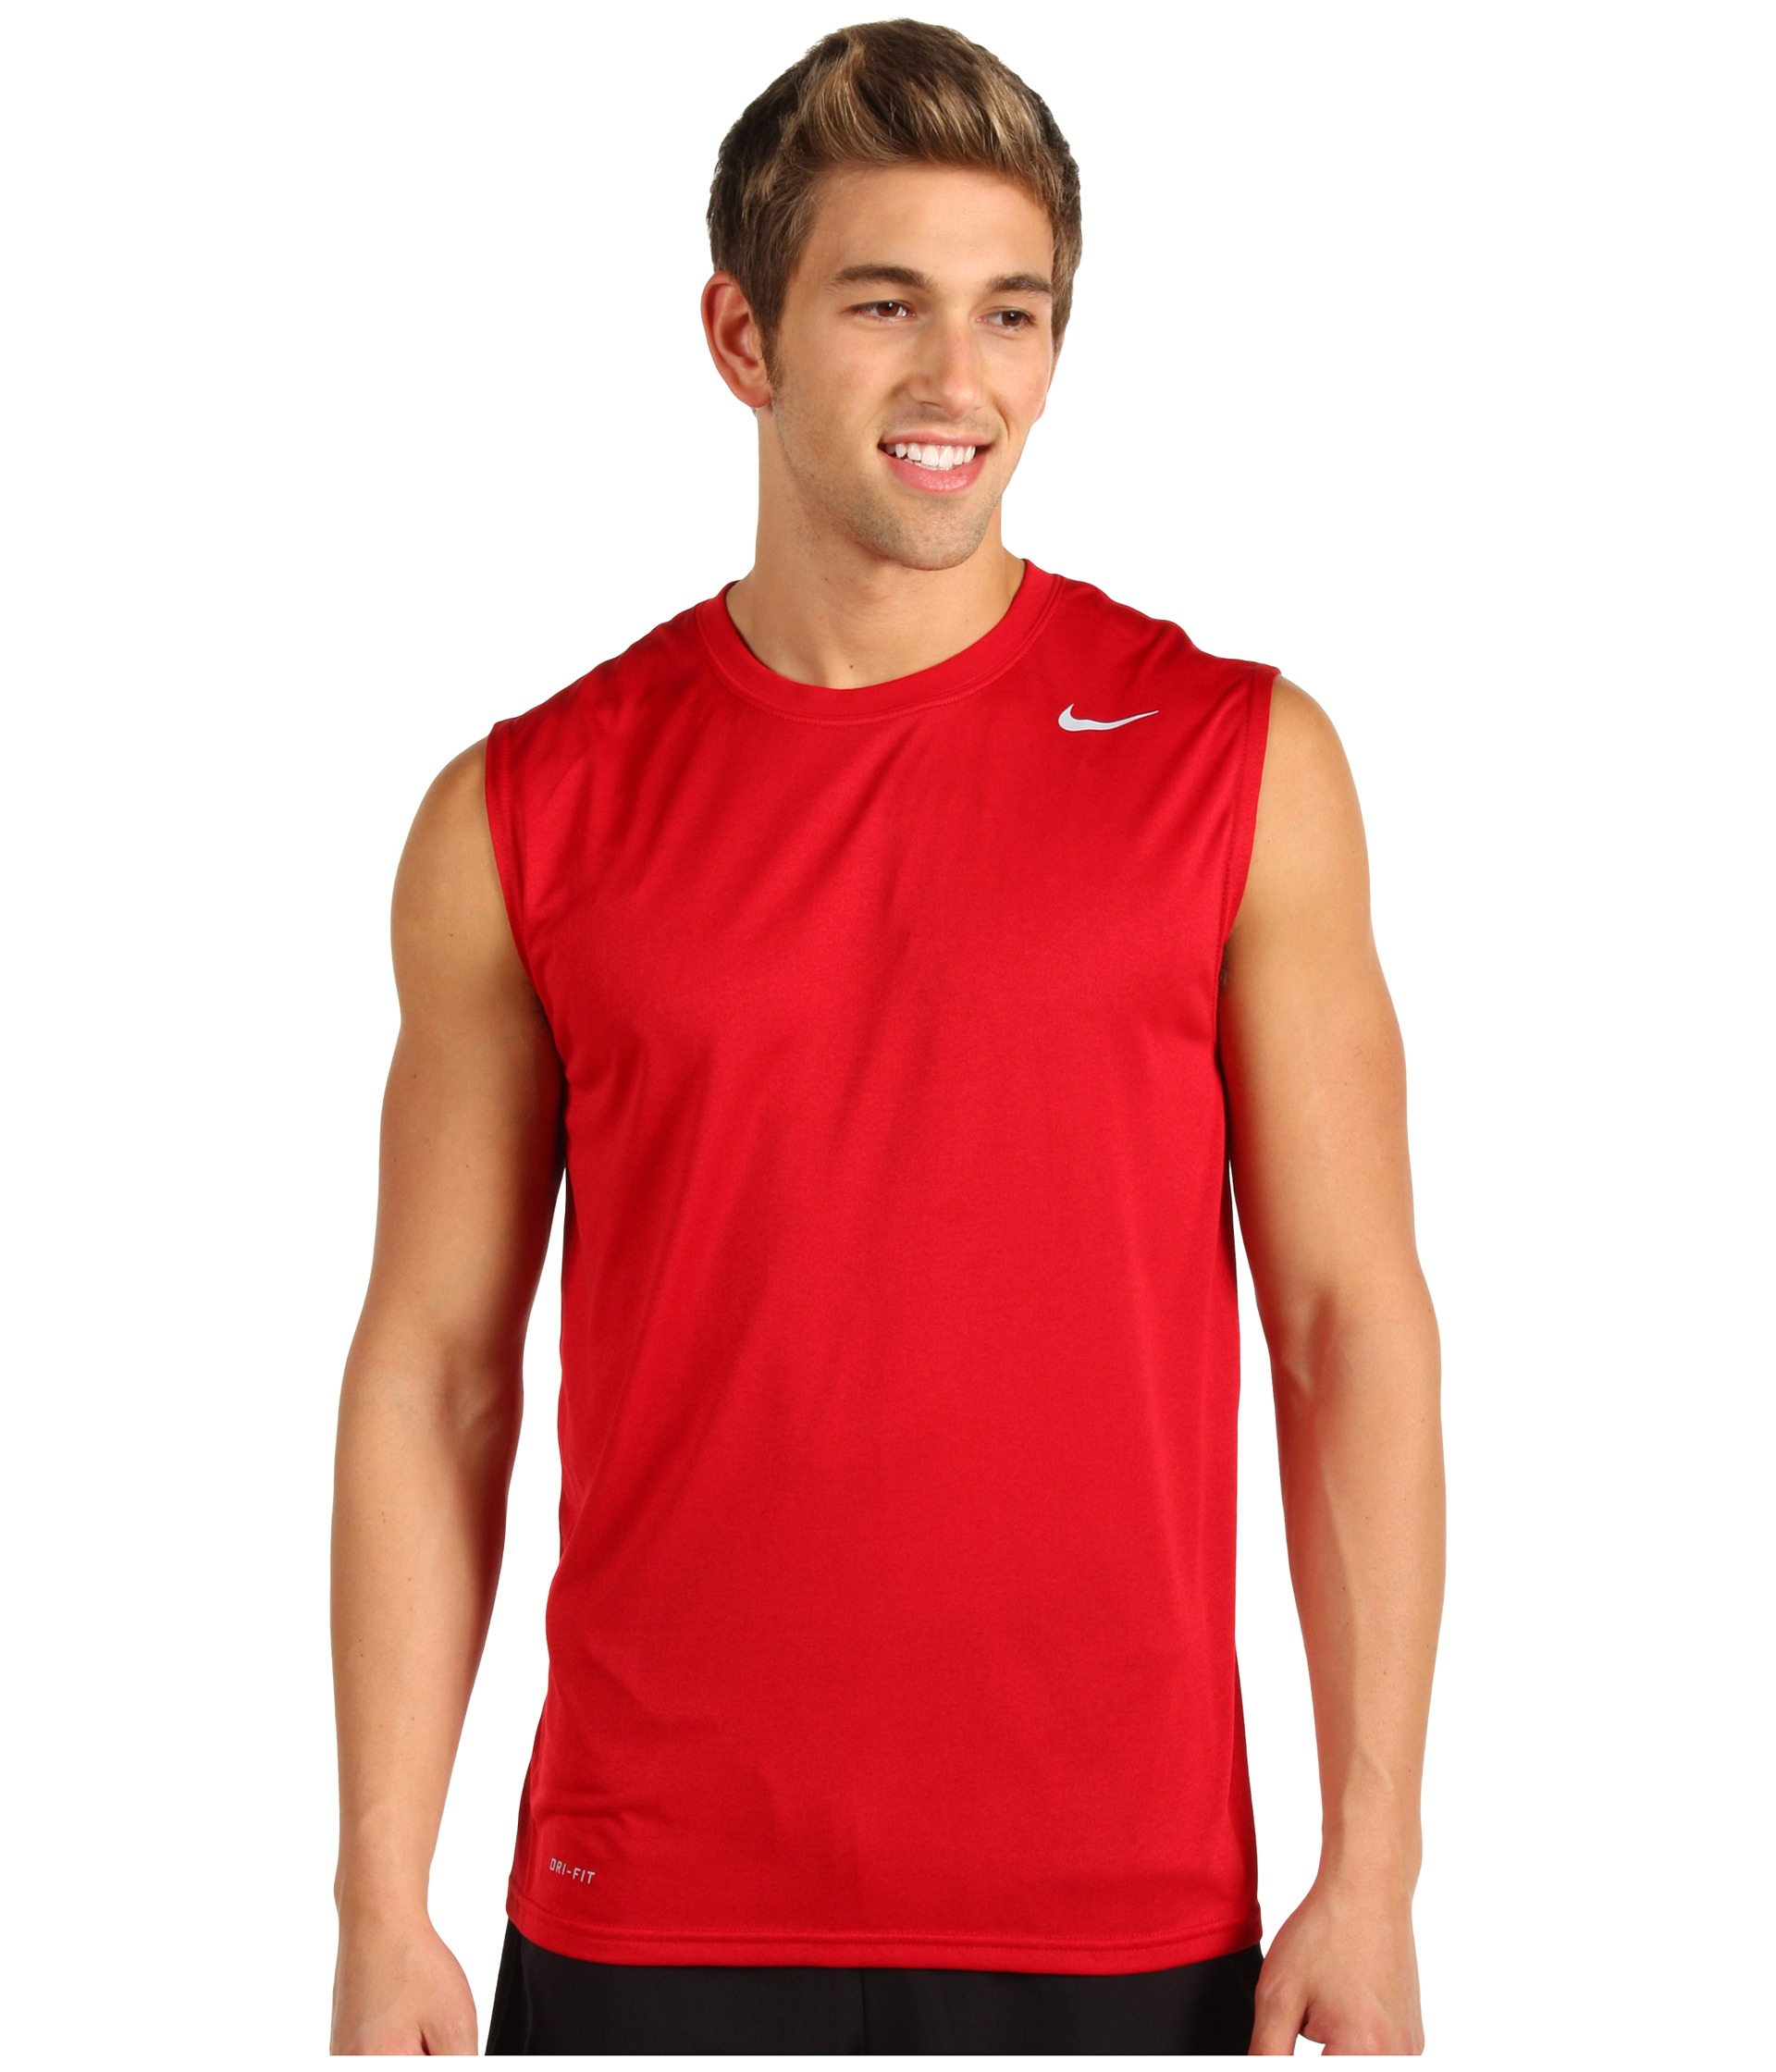 Dri Fit Sleeveless Shirt T Shirts Design Concept